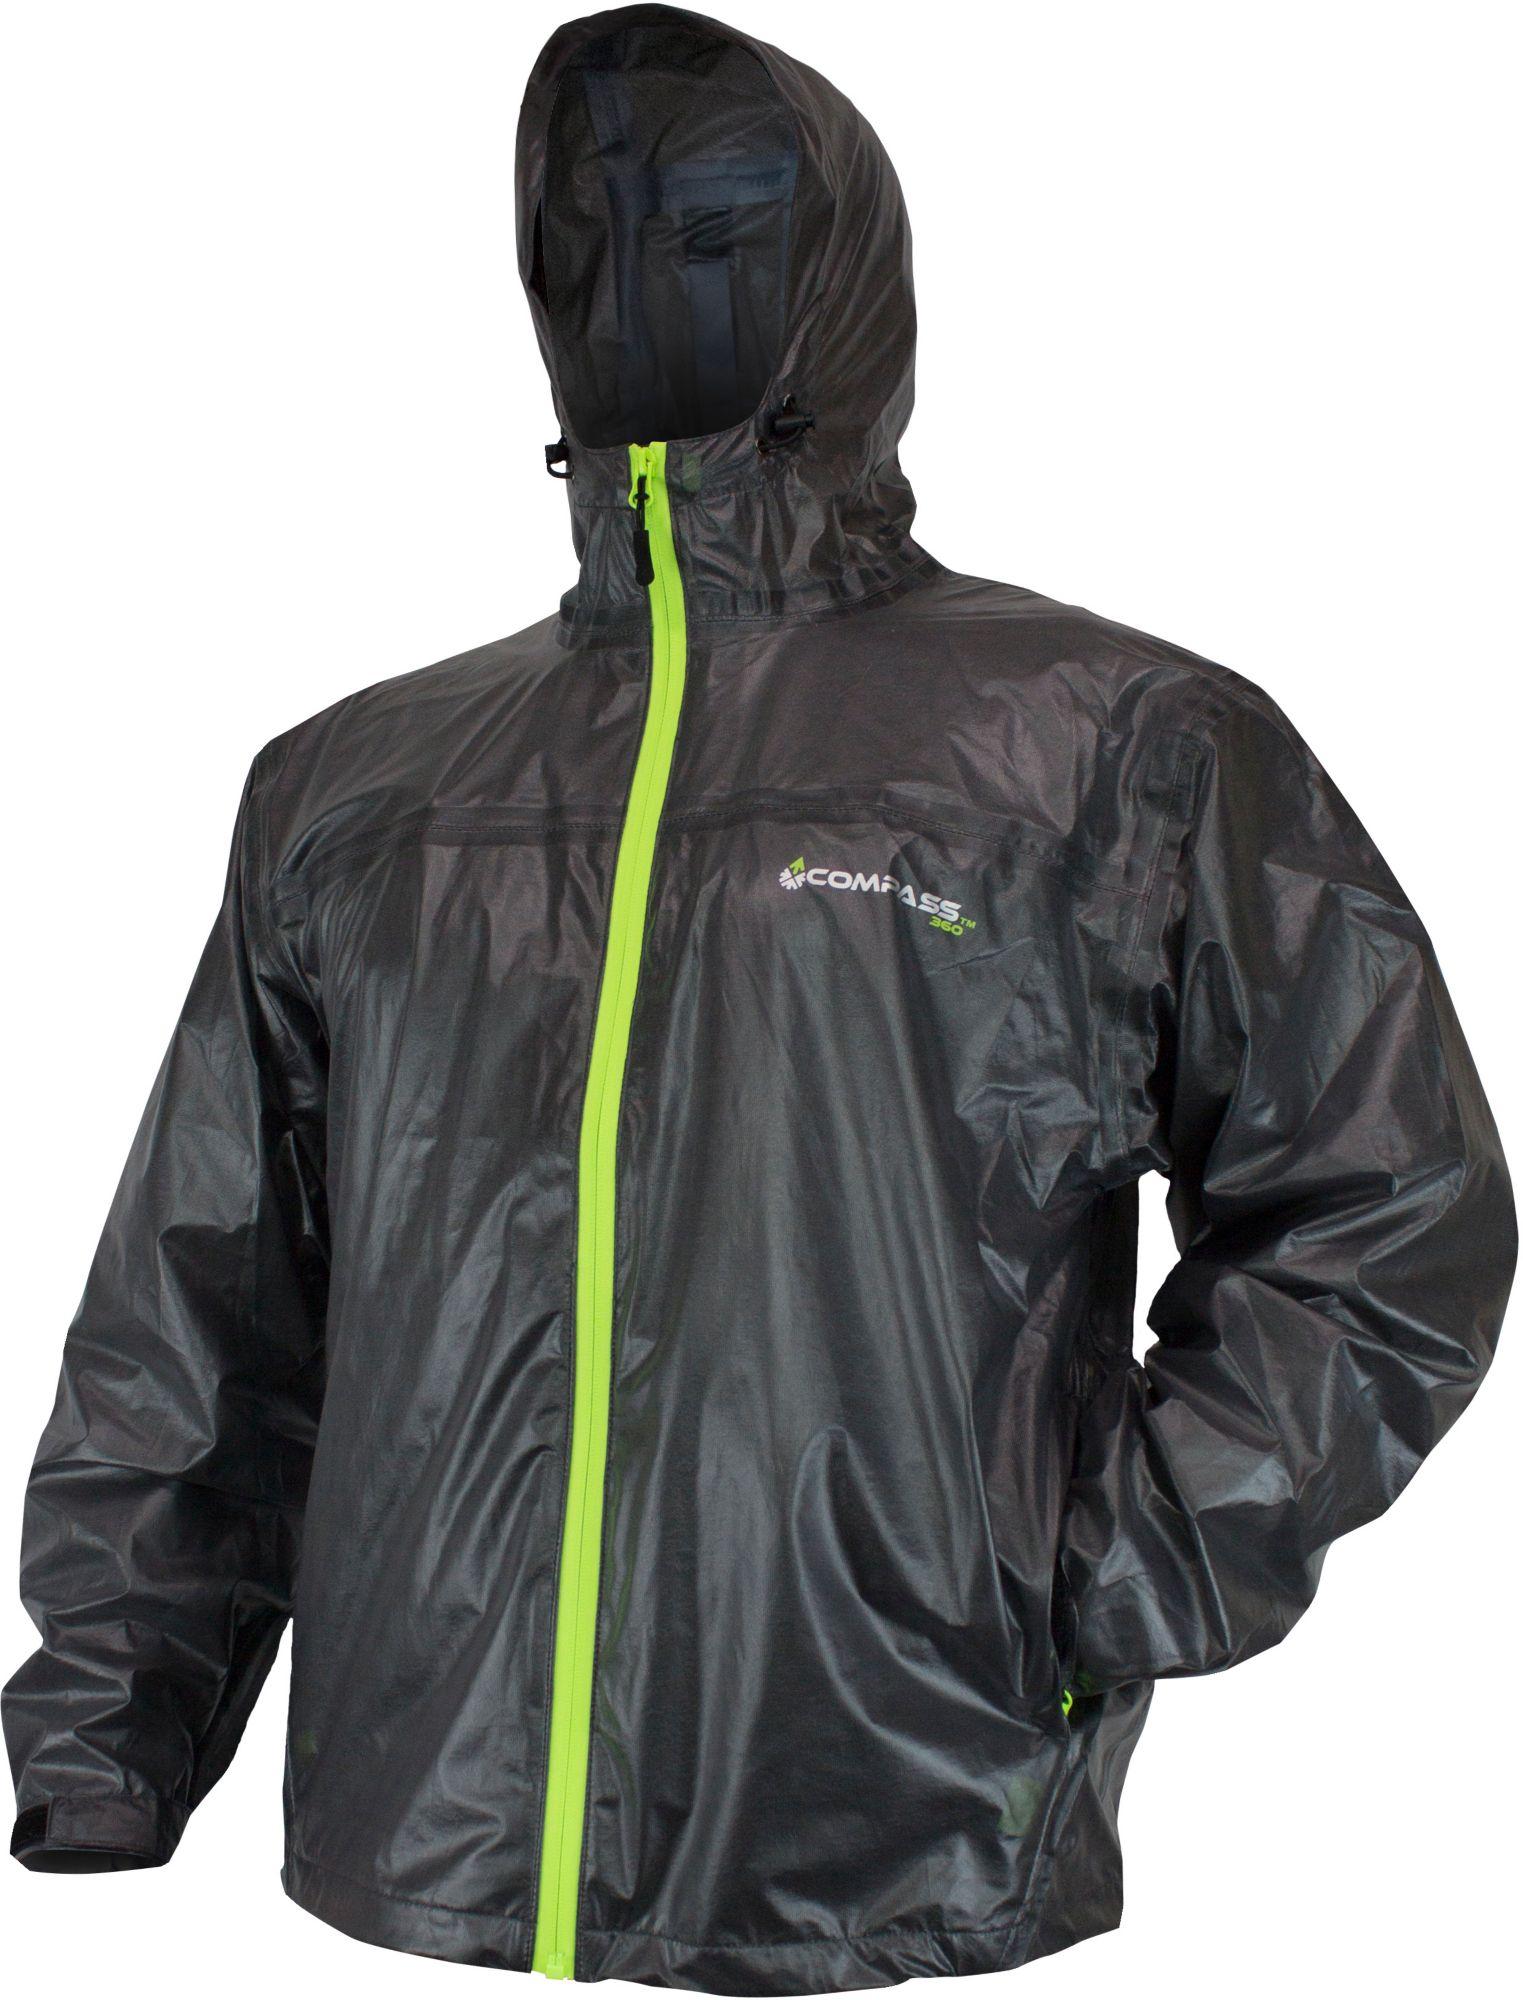 Compass 360 ULTRA-PAK Packable Rain Jacket, Men's, Medium, Black